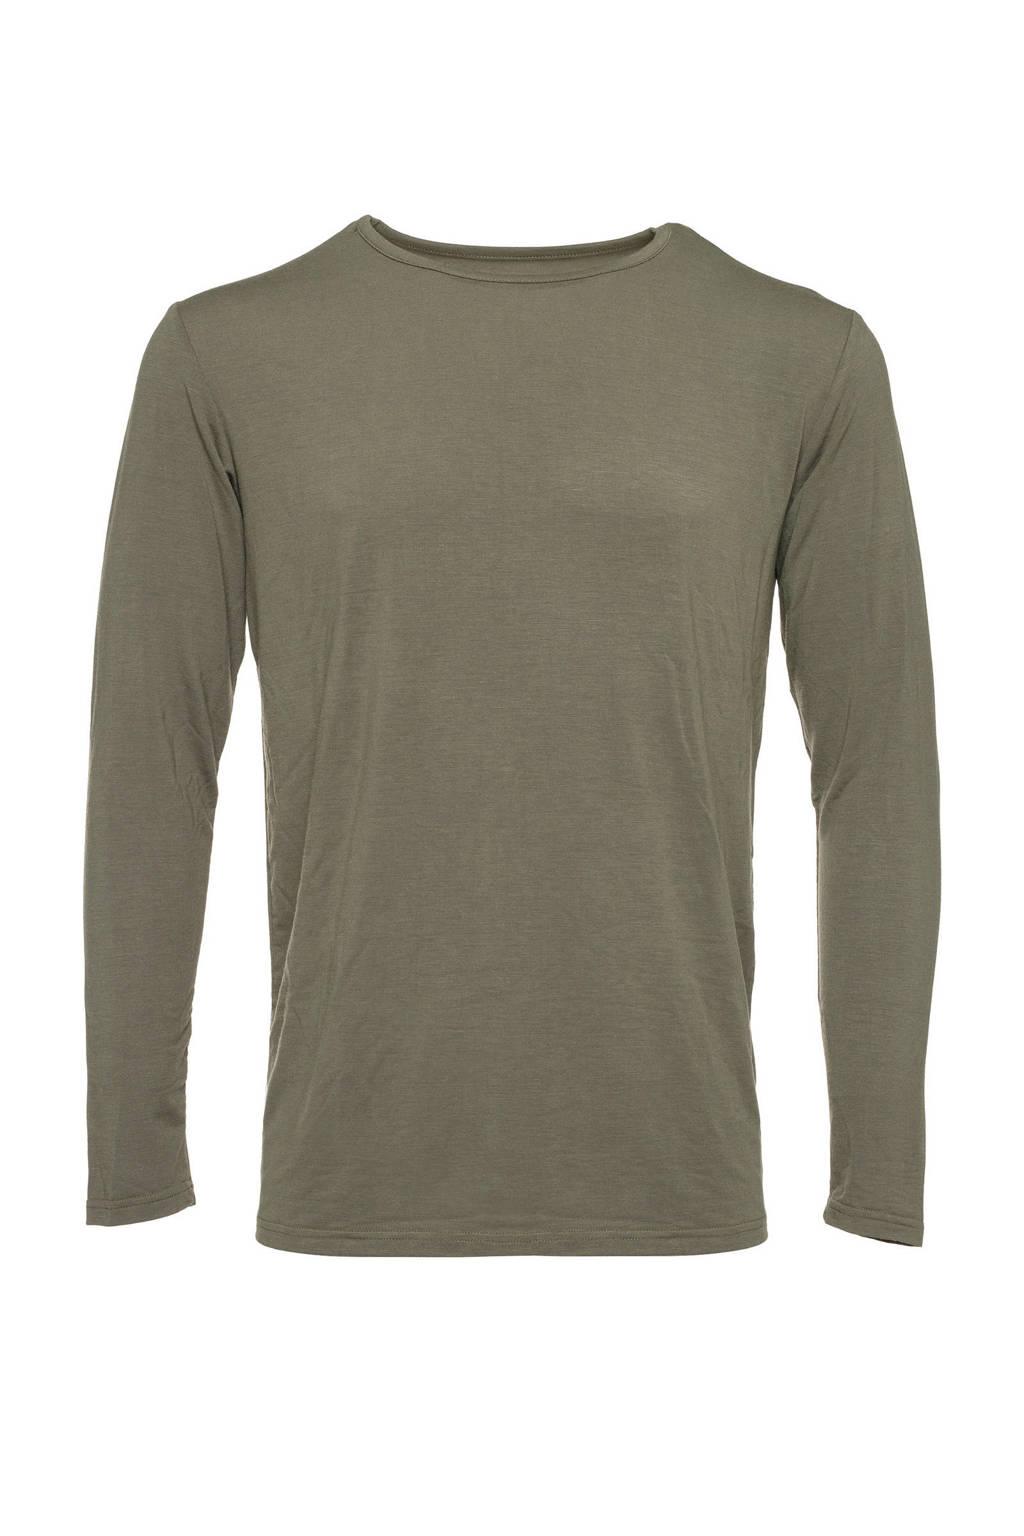 Mountain Peak thermo shirt groen, Groen